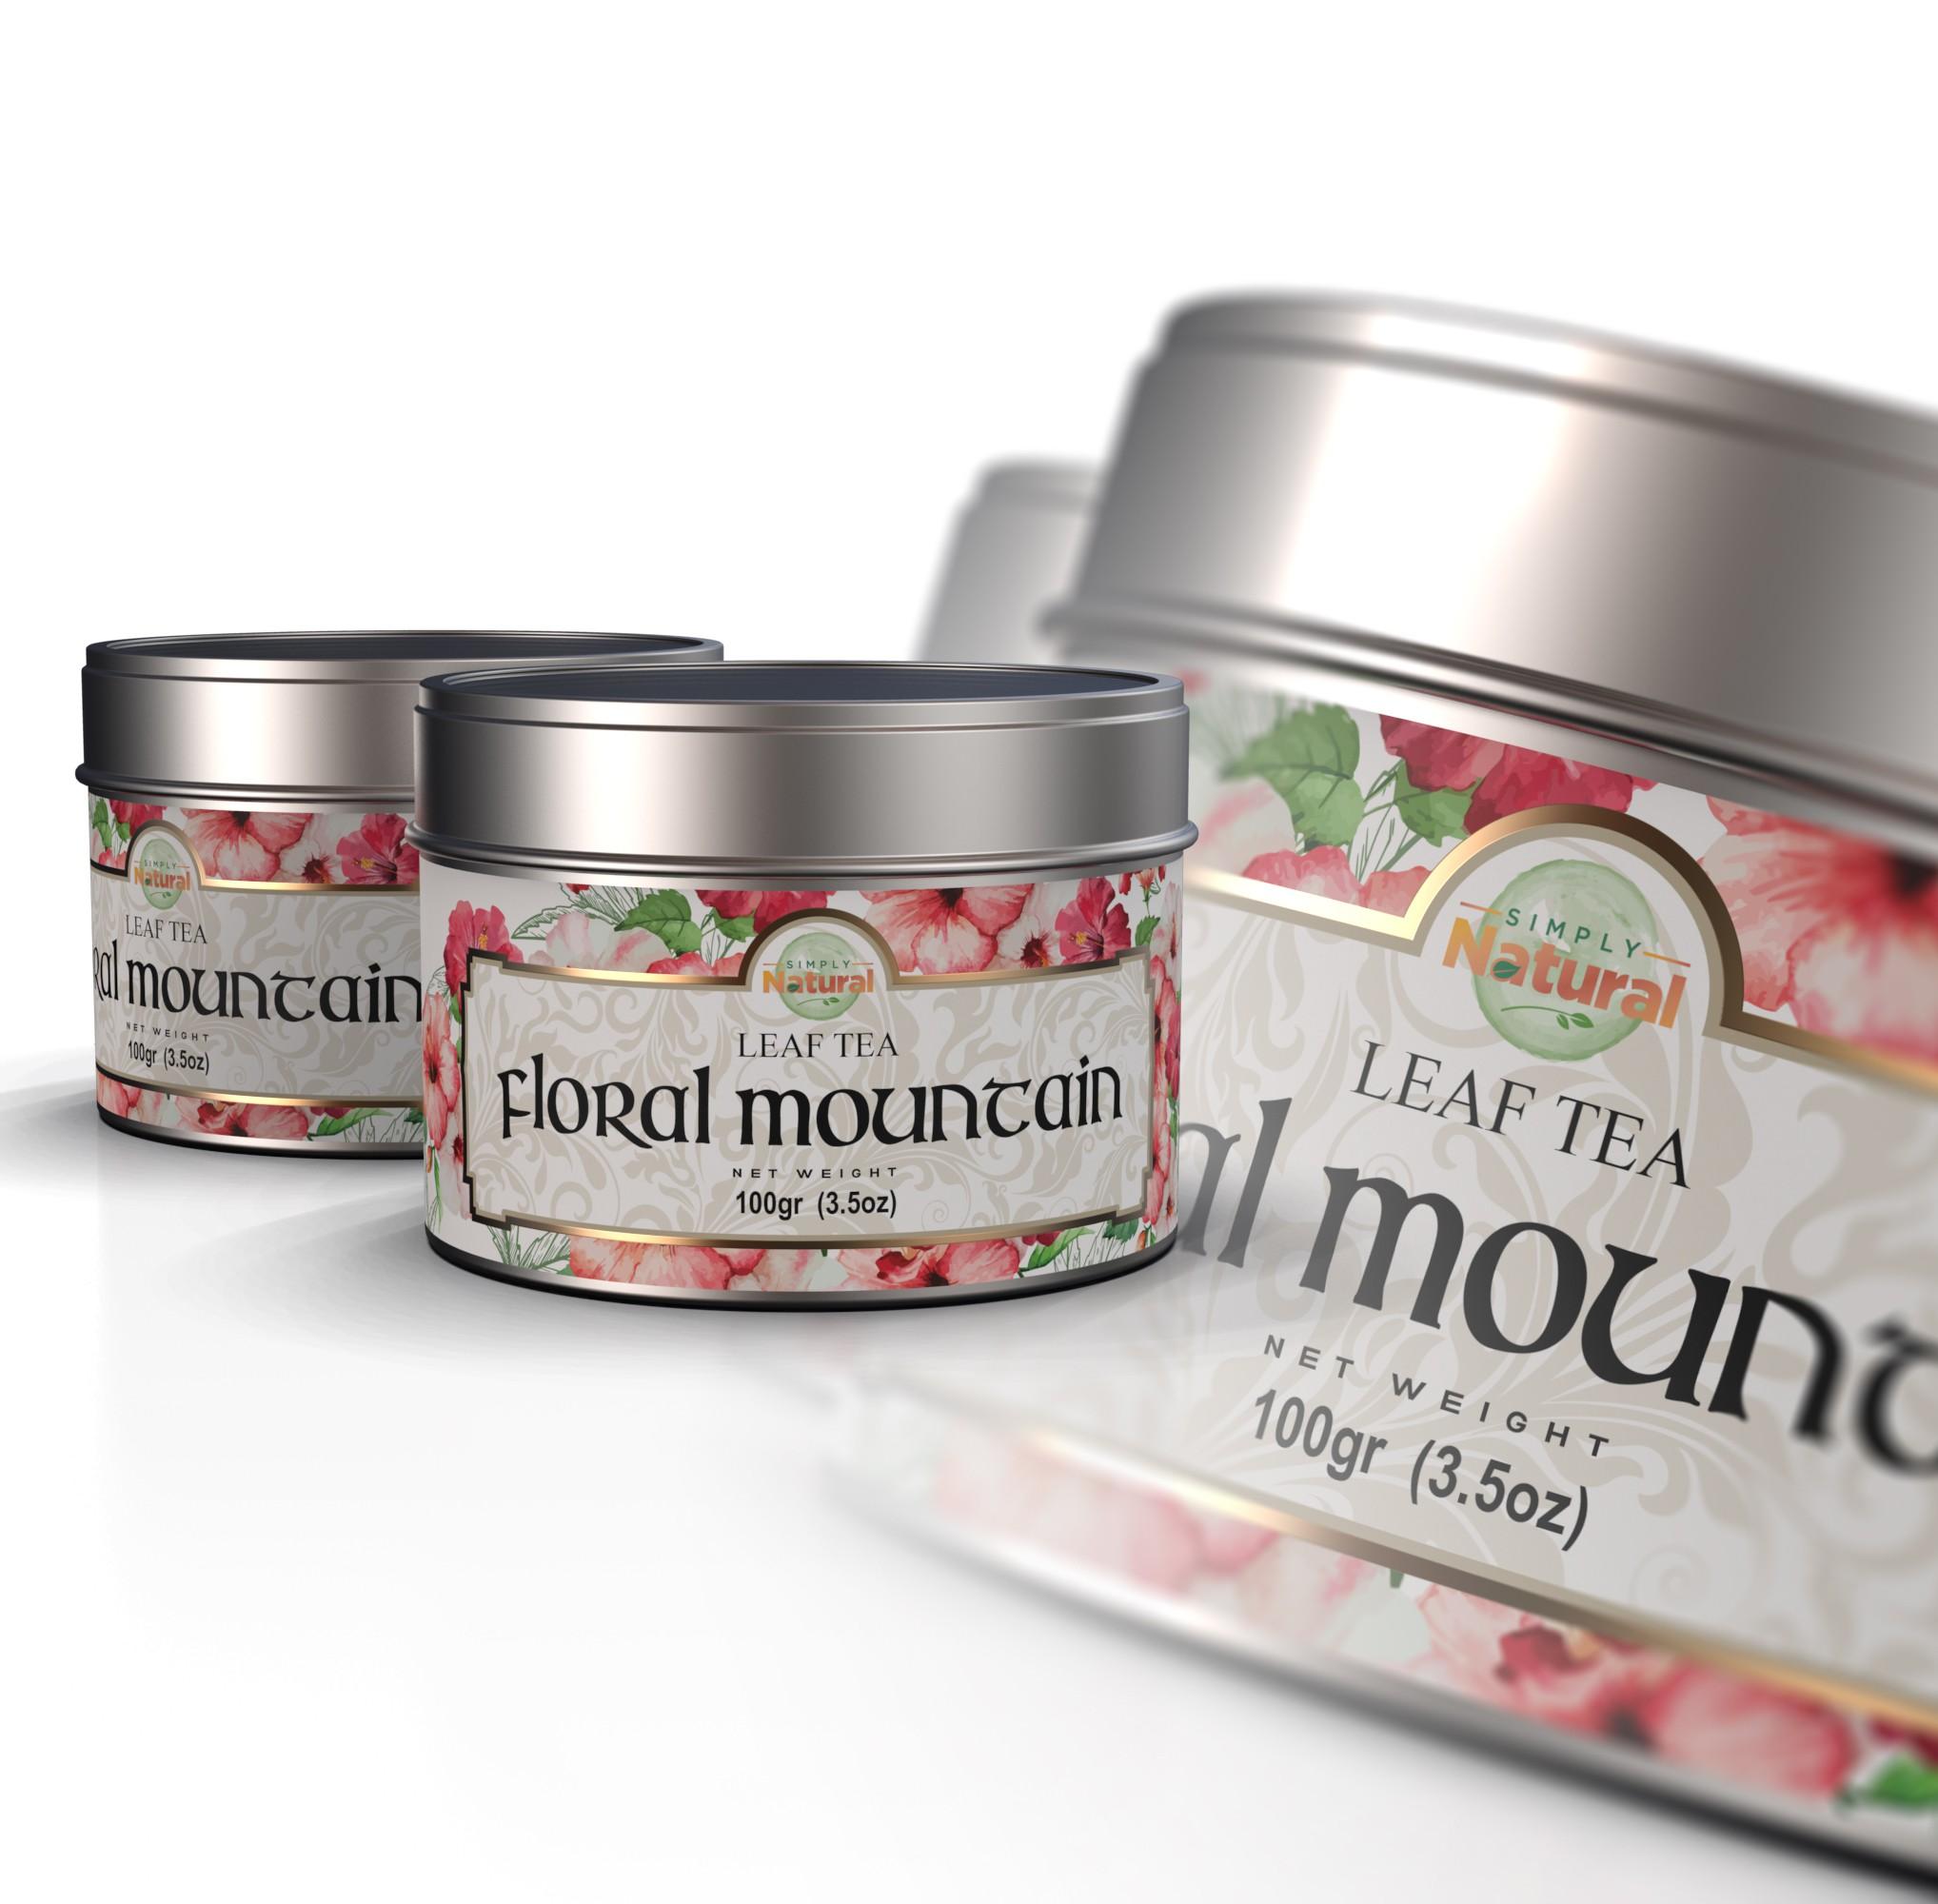 Label for tea